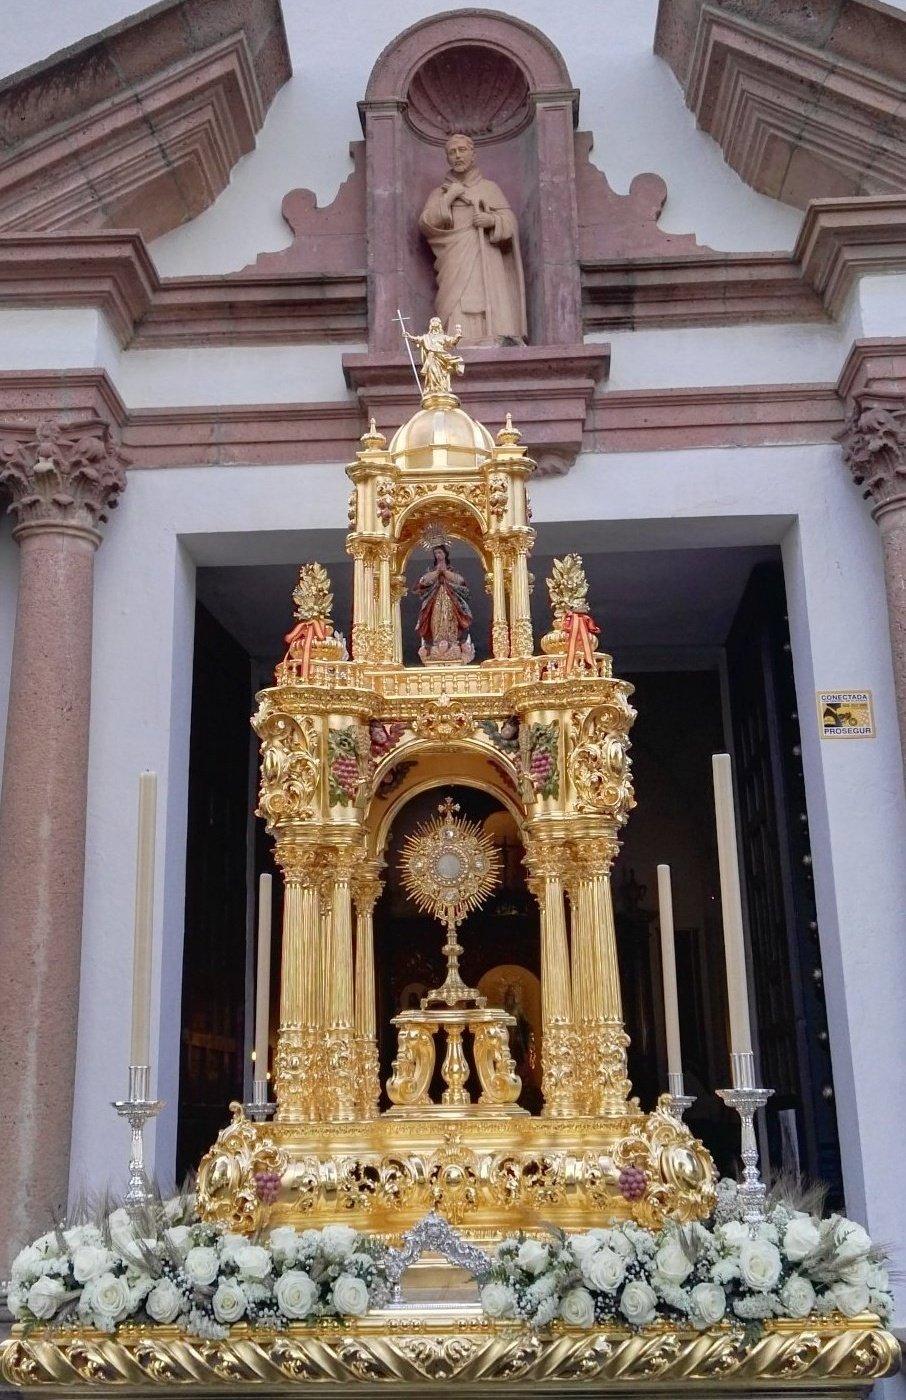 San Gonzalo cede su custodia procesional para la muestra «Pange lingua. Custodias de Sevilla»